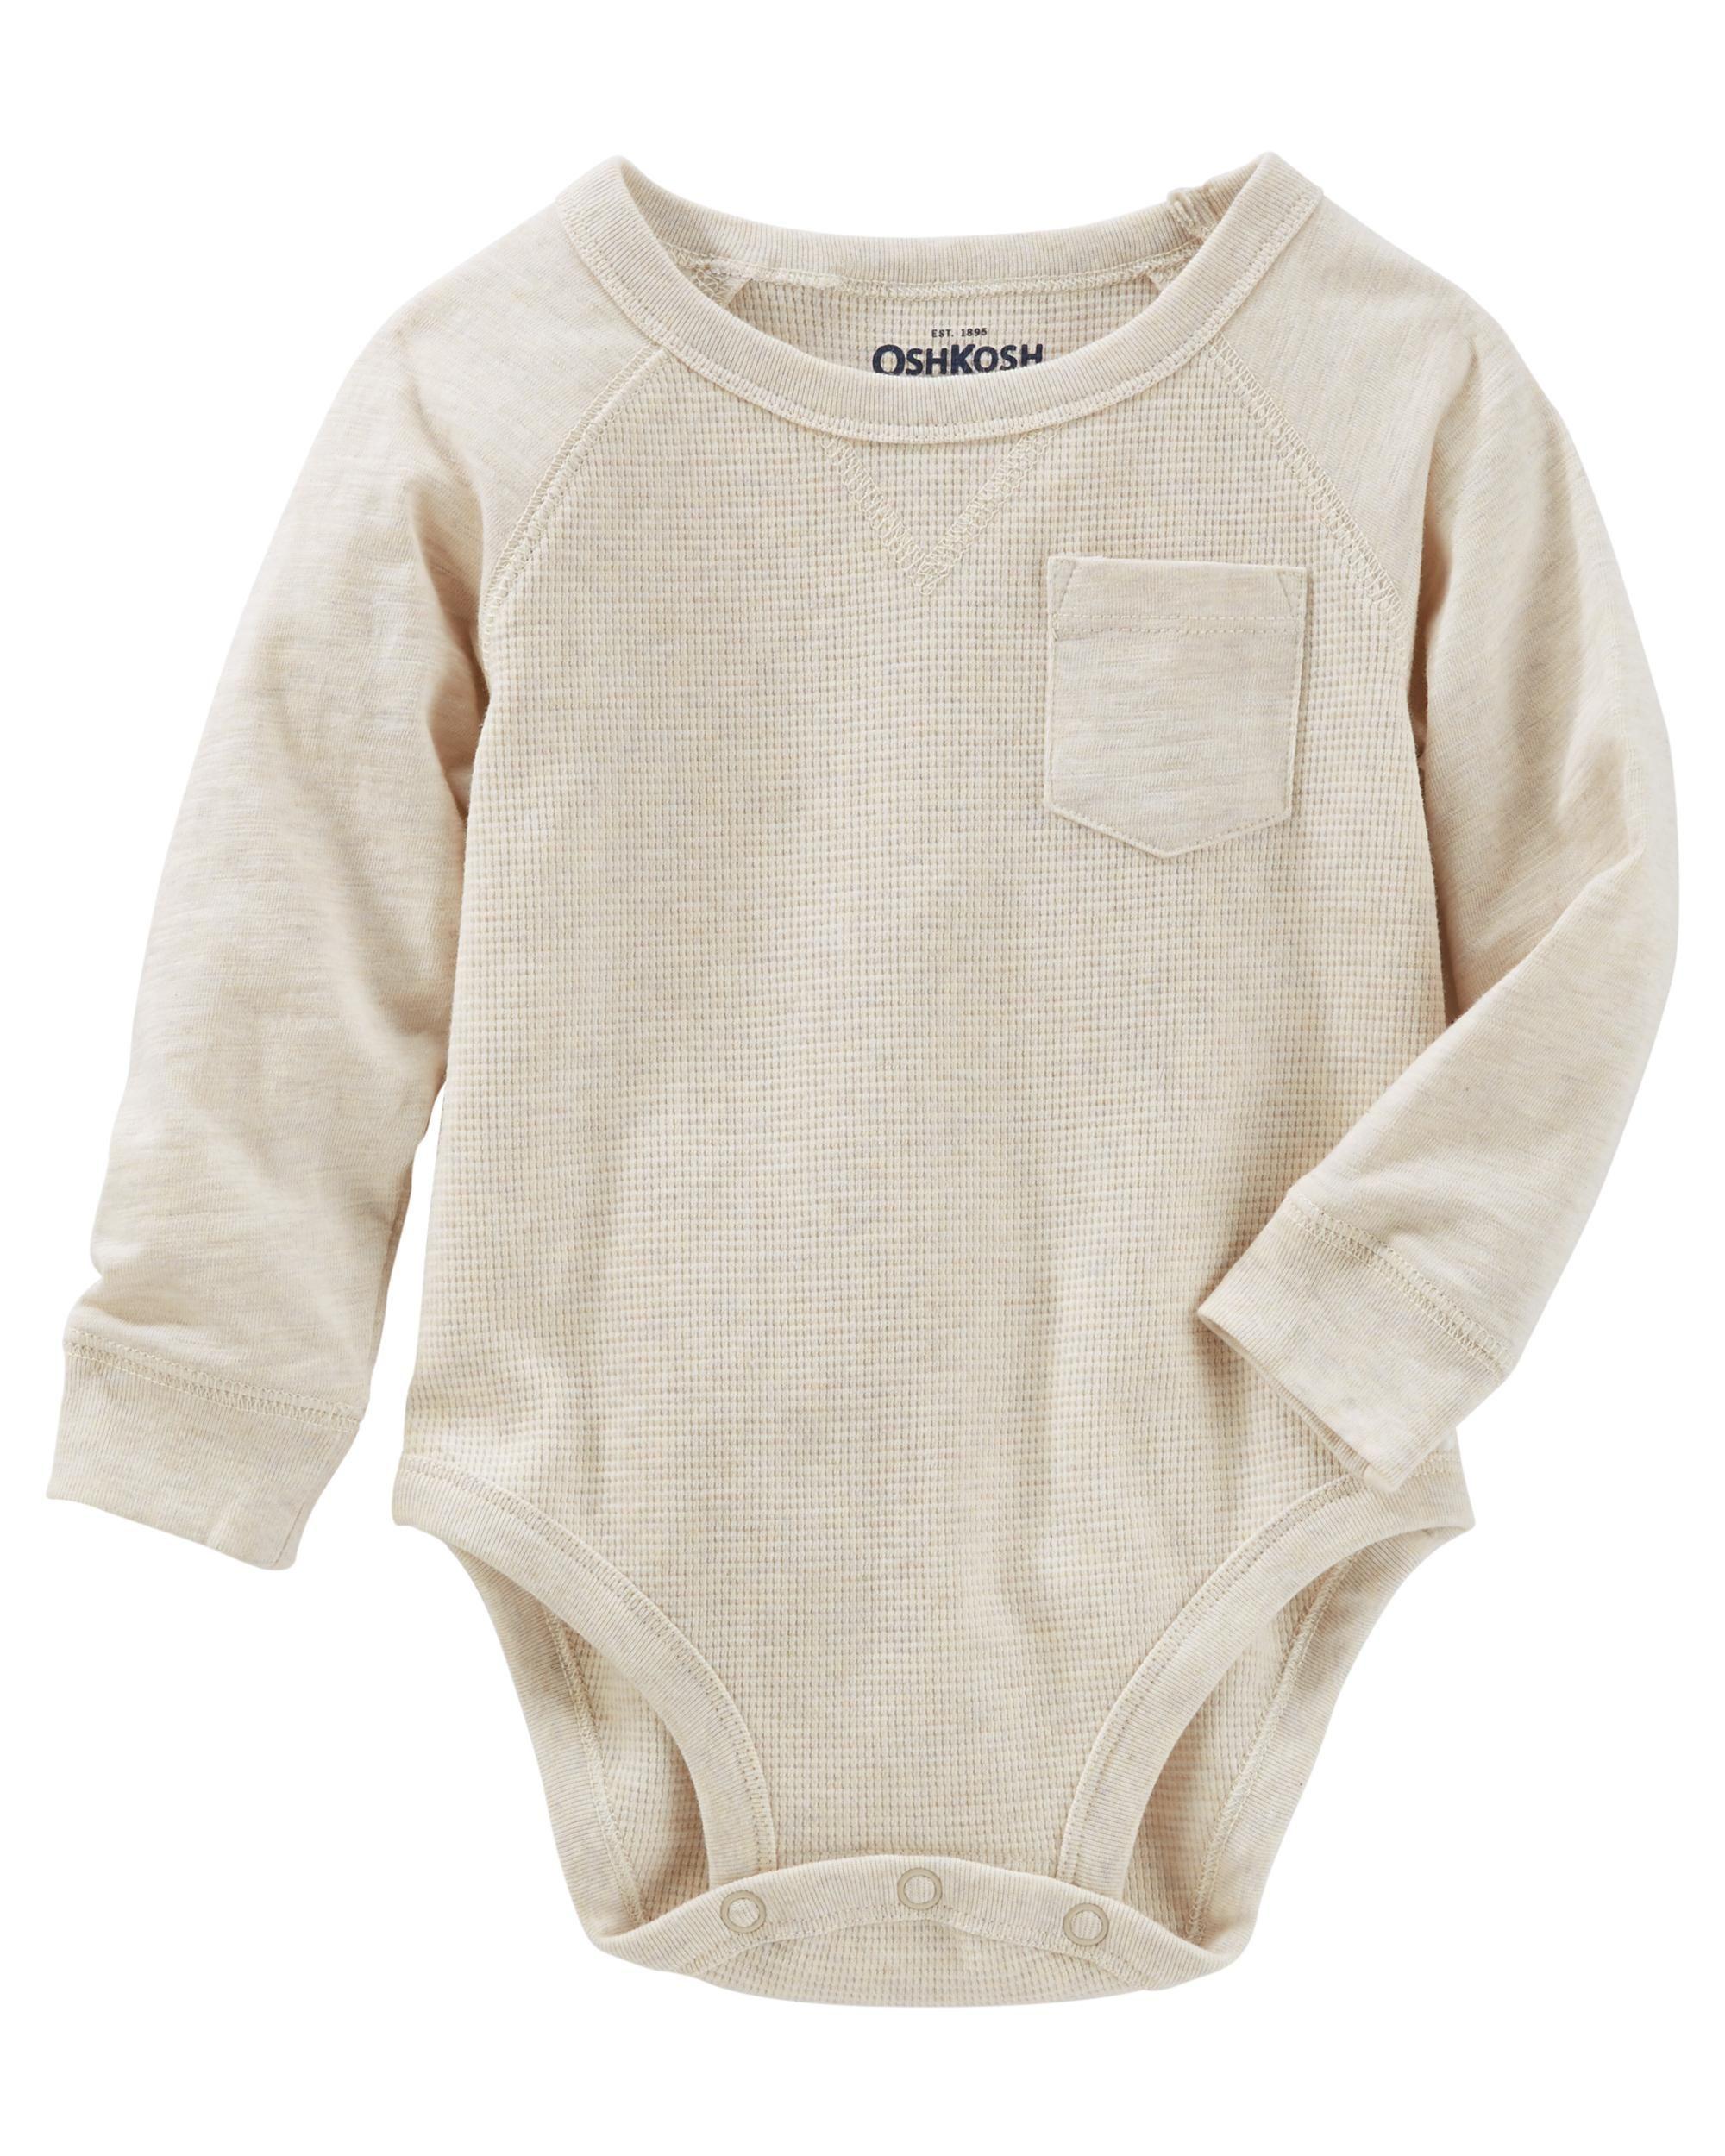 Raglan Pocket Thermal Bodysuit from OshKosh B gosh Shop clothing